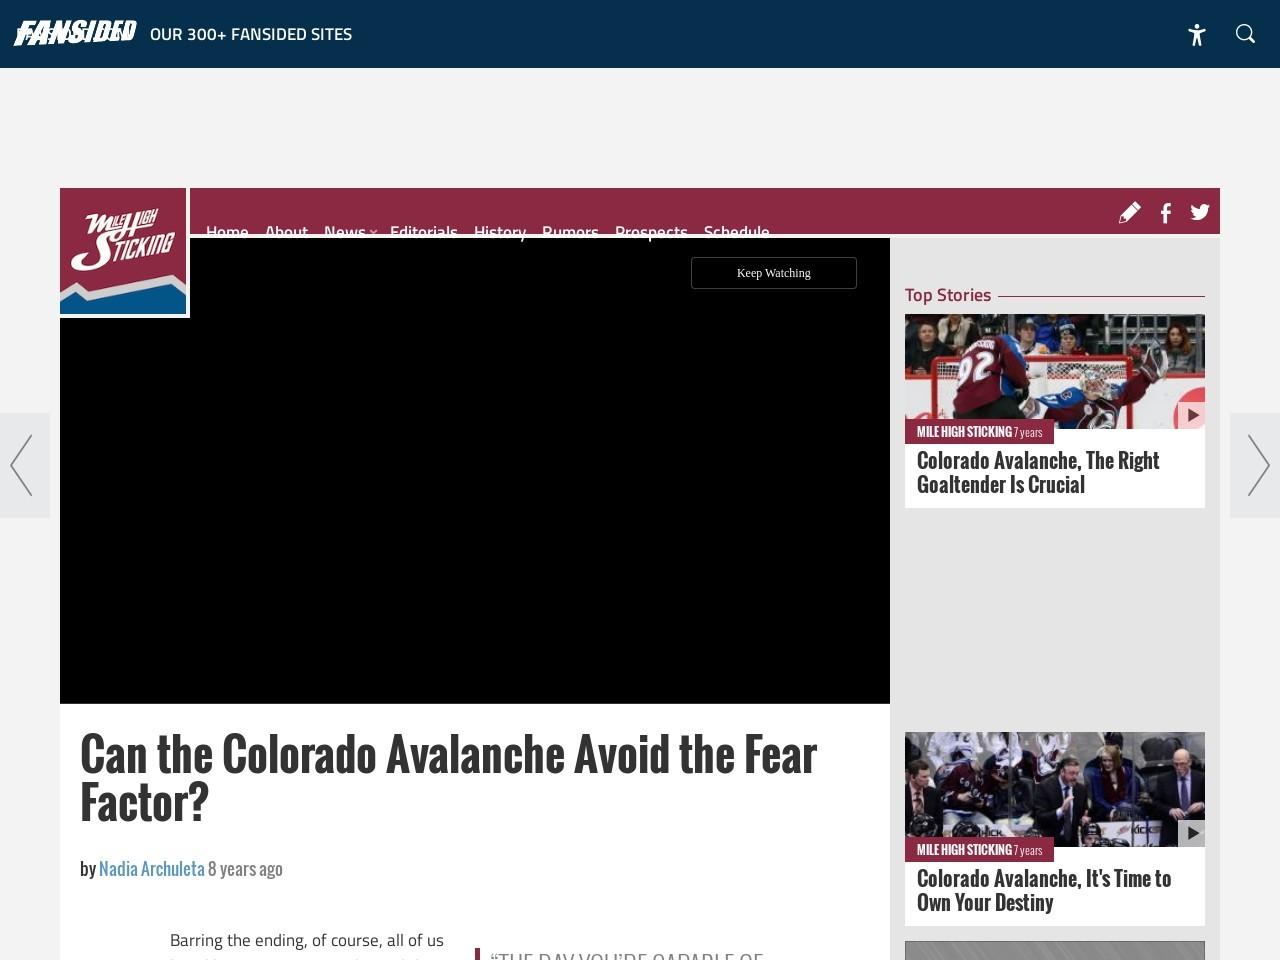 Can the Colorado Avalanche Avoid the Fear Factor?